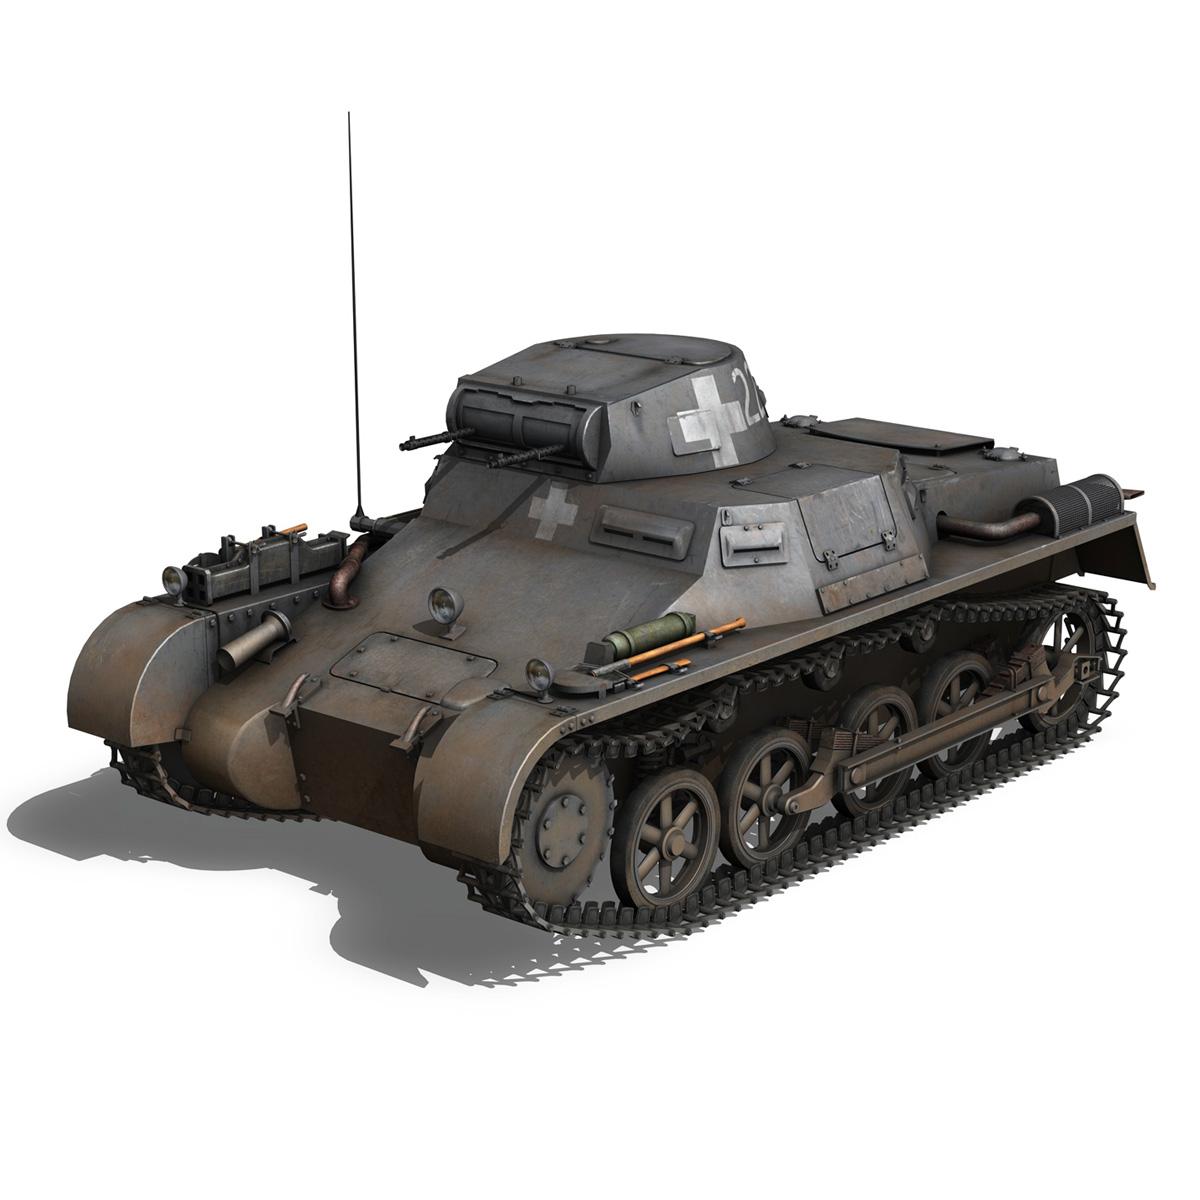 pzkpfw 1 - Panzer 1 - ausf. a - 22 3d modell 3ds fbx c4d lwo obj 186928